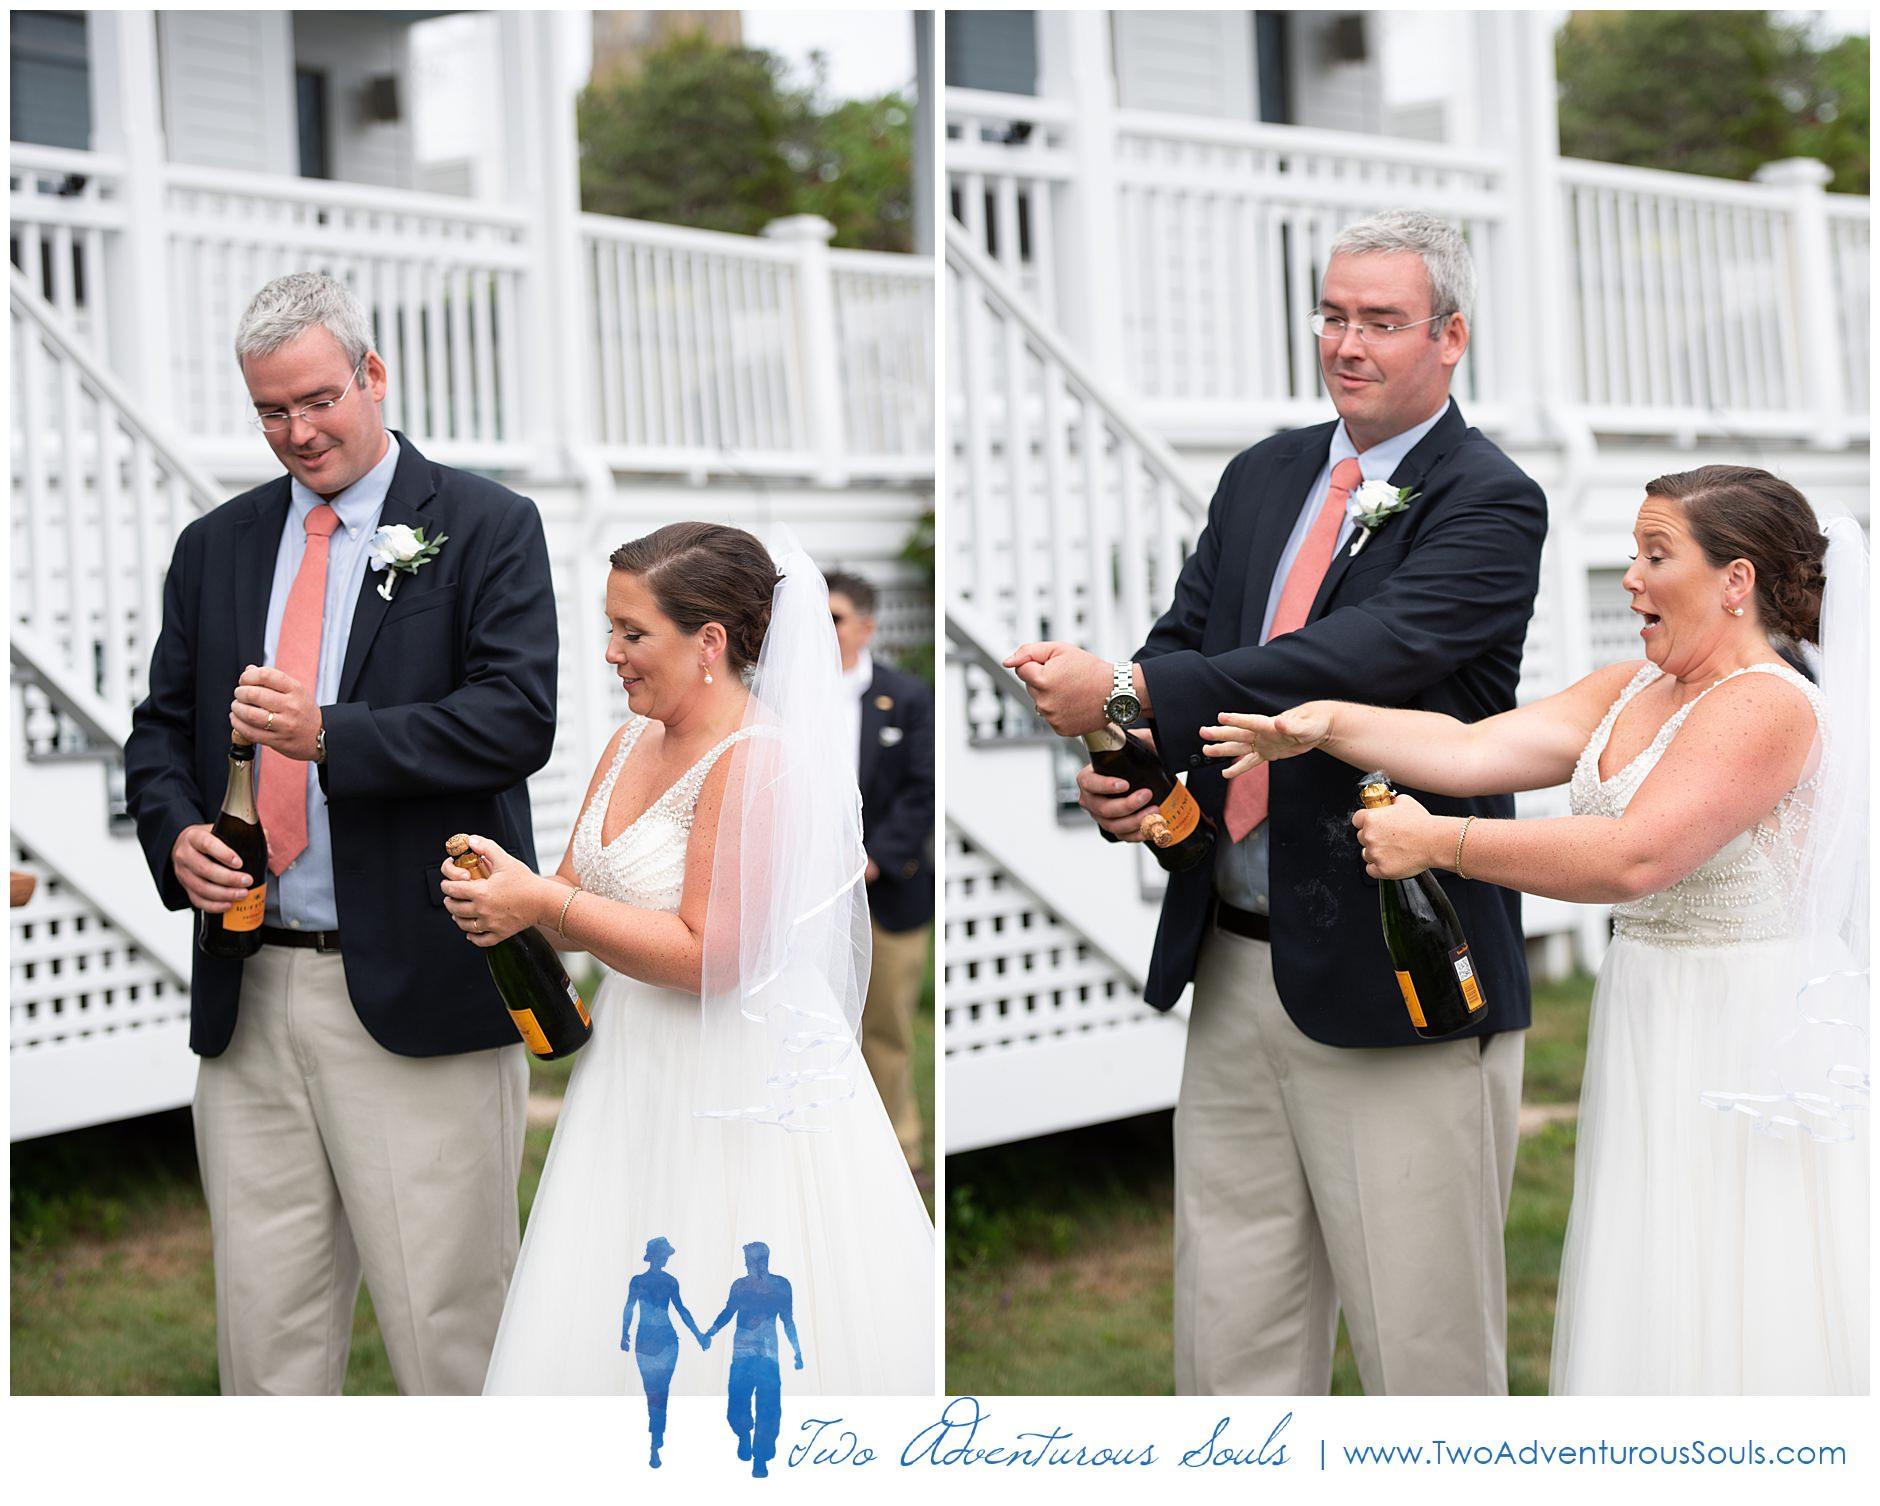 Maine Wedding Photographers, Ogunquit Wedding Photographers, Maine Elopement Photographers, Two Adventurous Souls-080619_0018.jpg